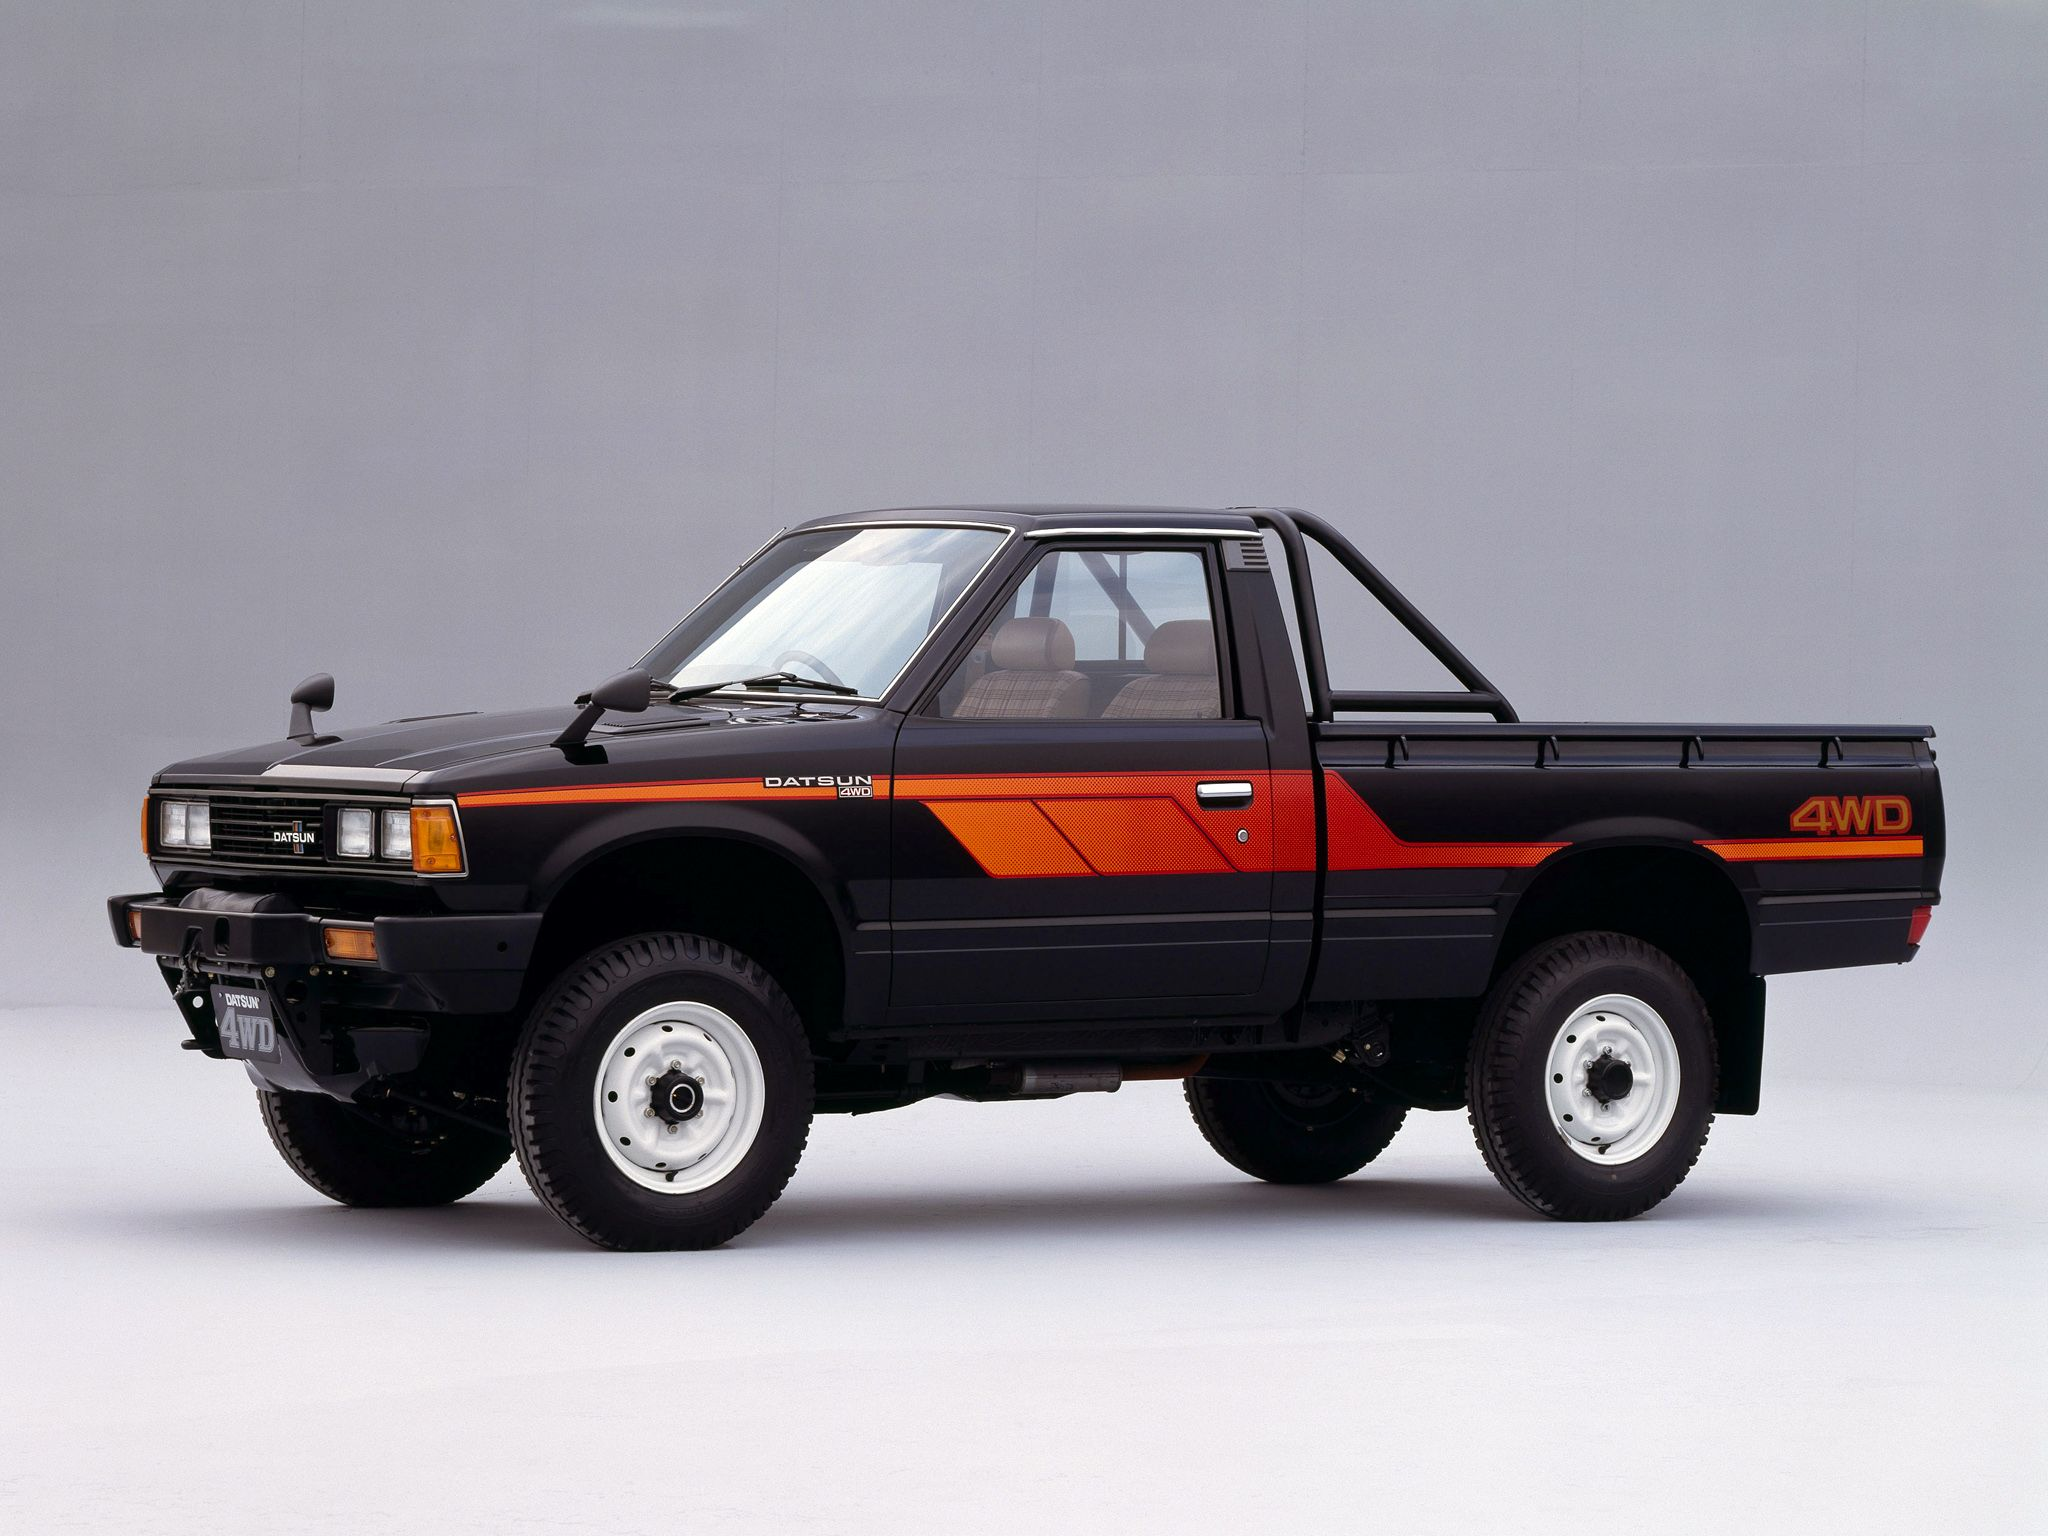 23 Datsun Pickup Ideas سيارة نيس تويوتا